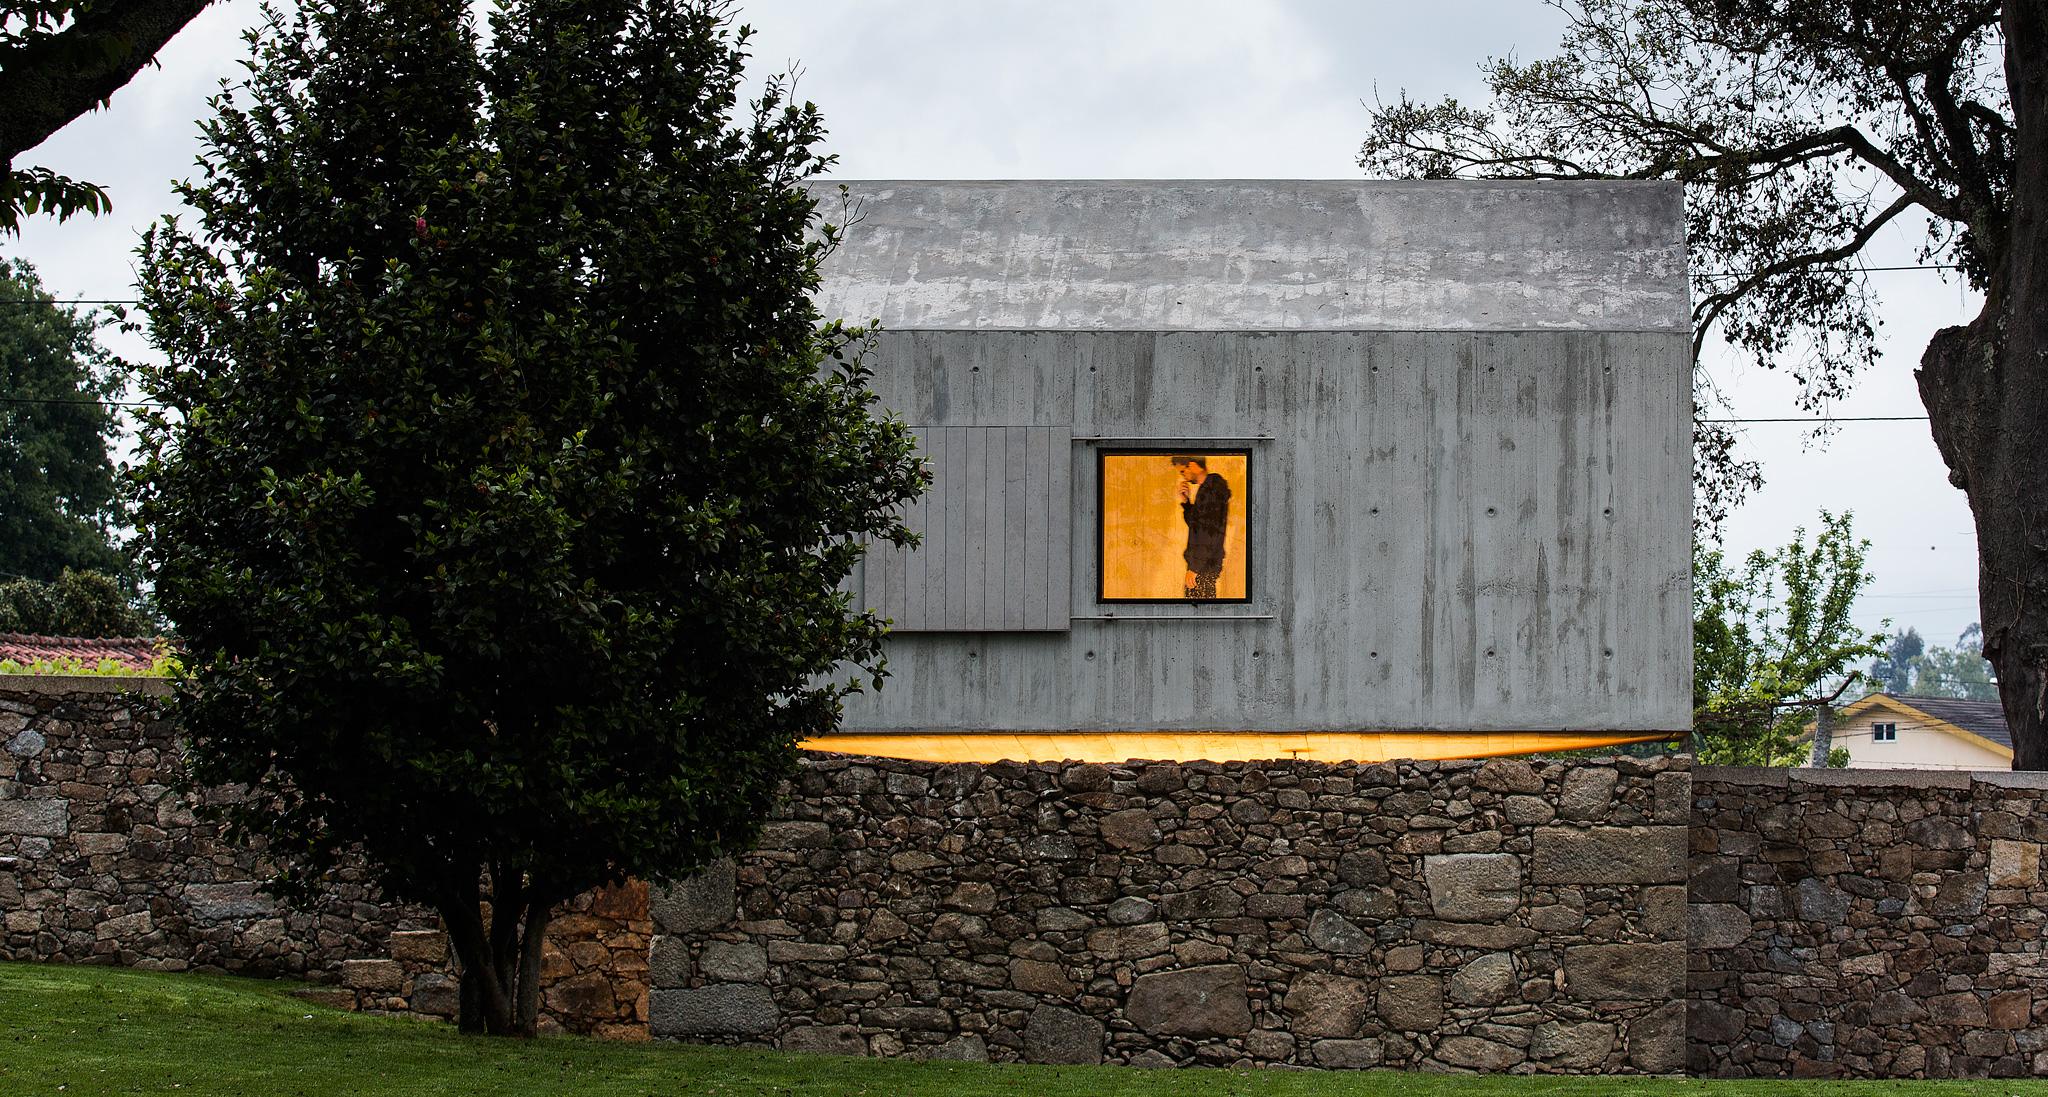 Concrete dreams; inside the Dovecote by Sequeira Arquitectos